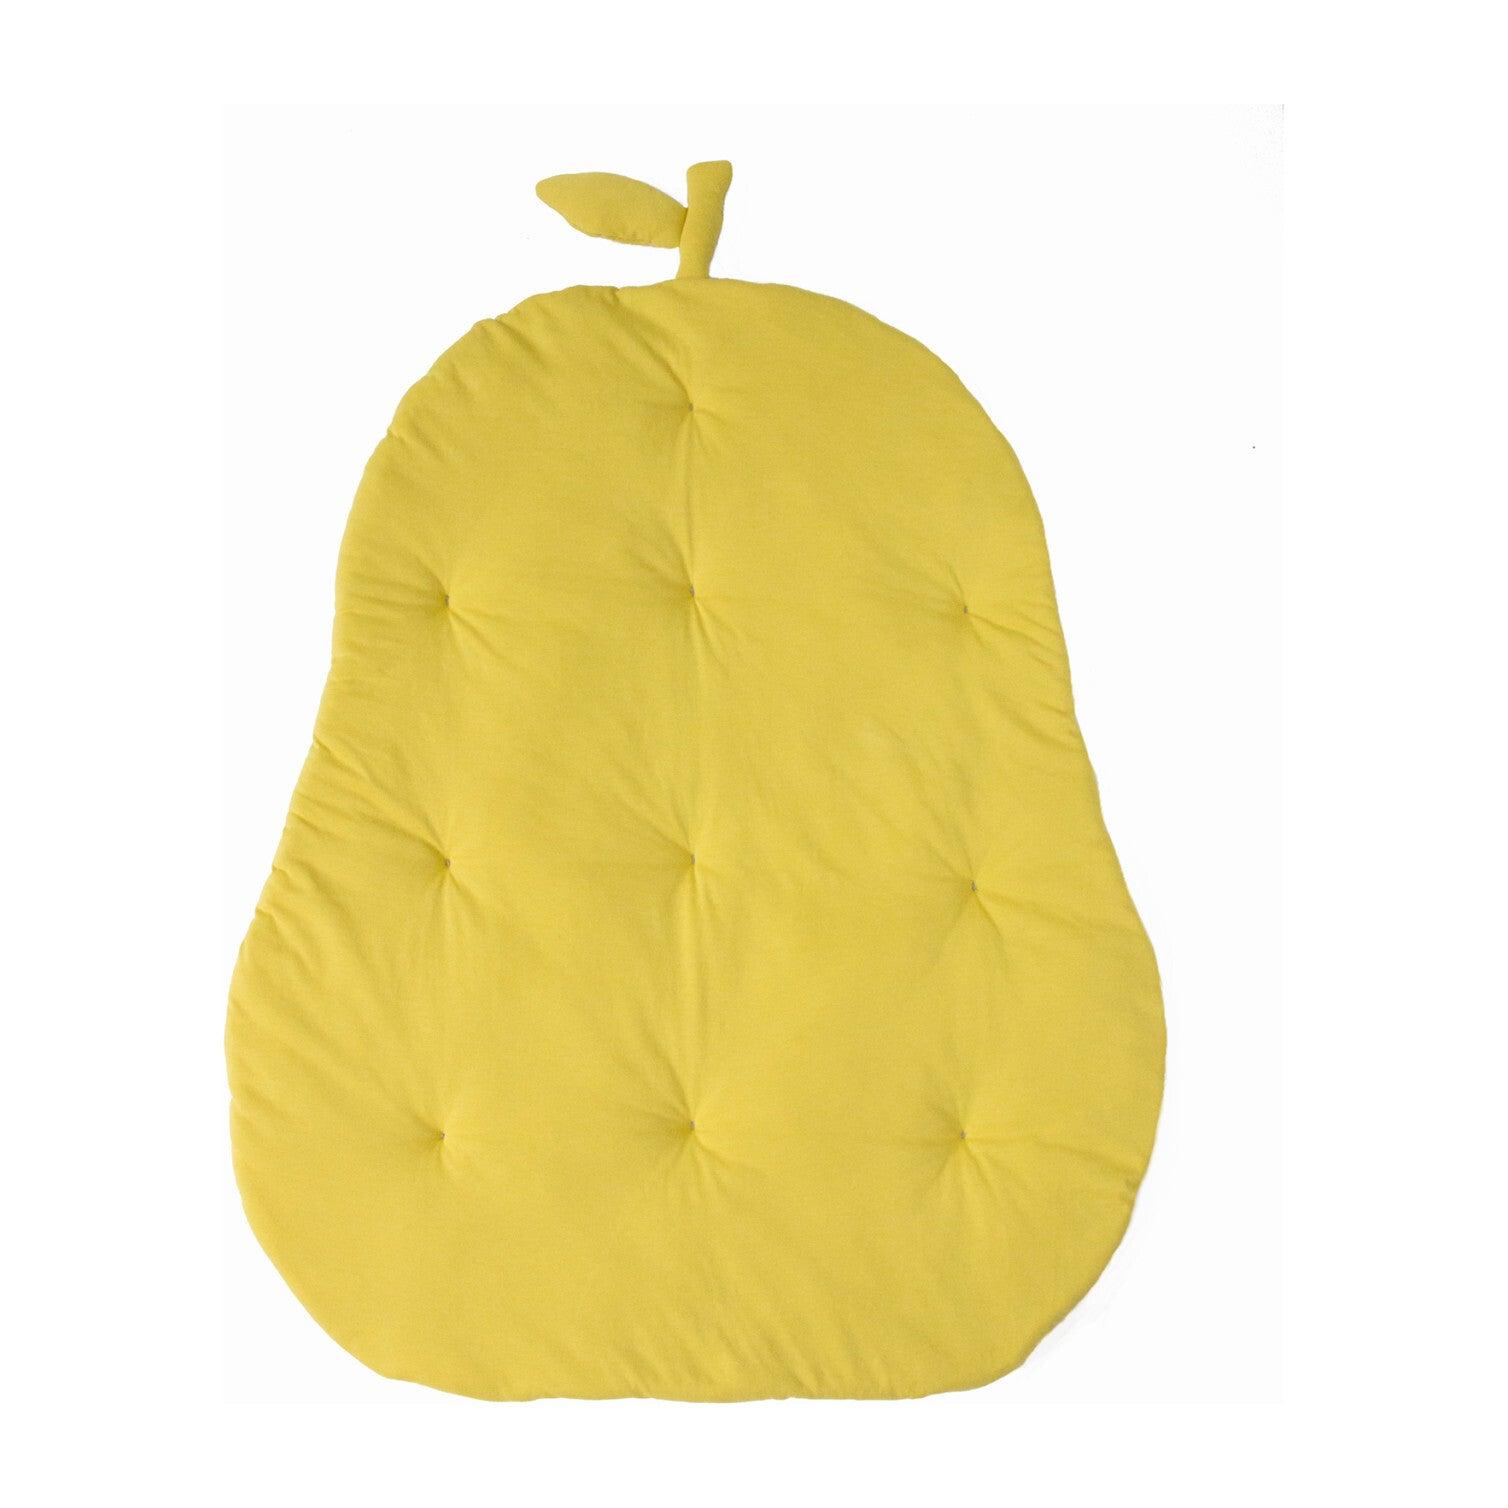 Pear Playmat, Citron